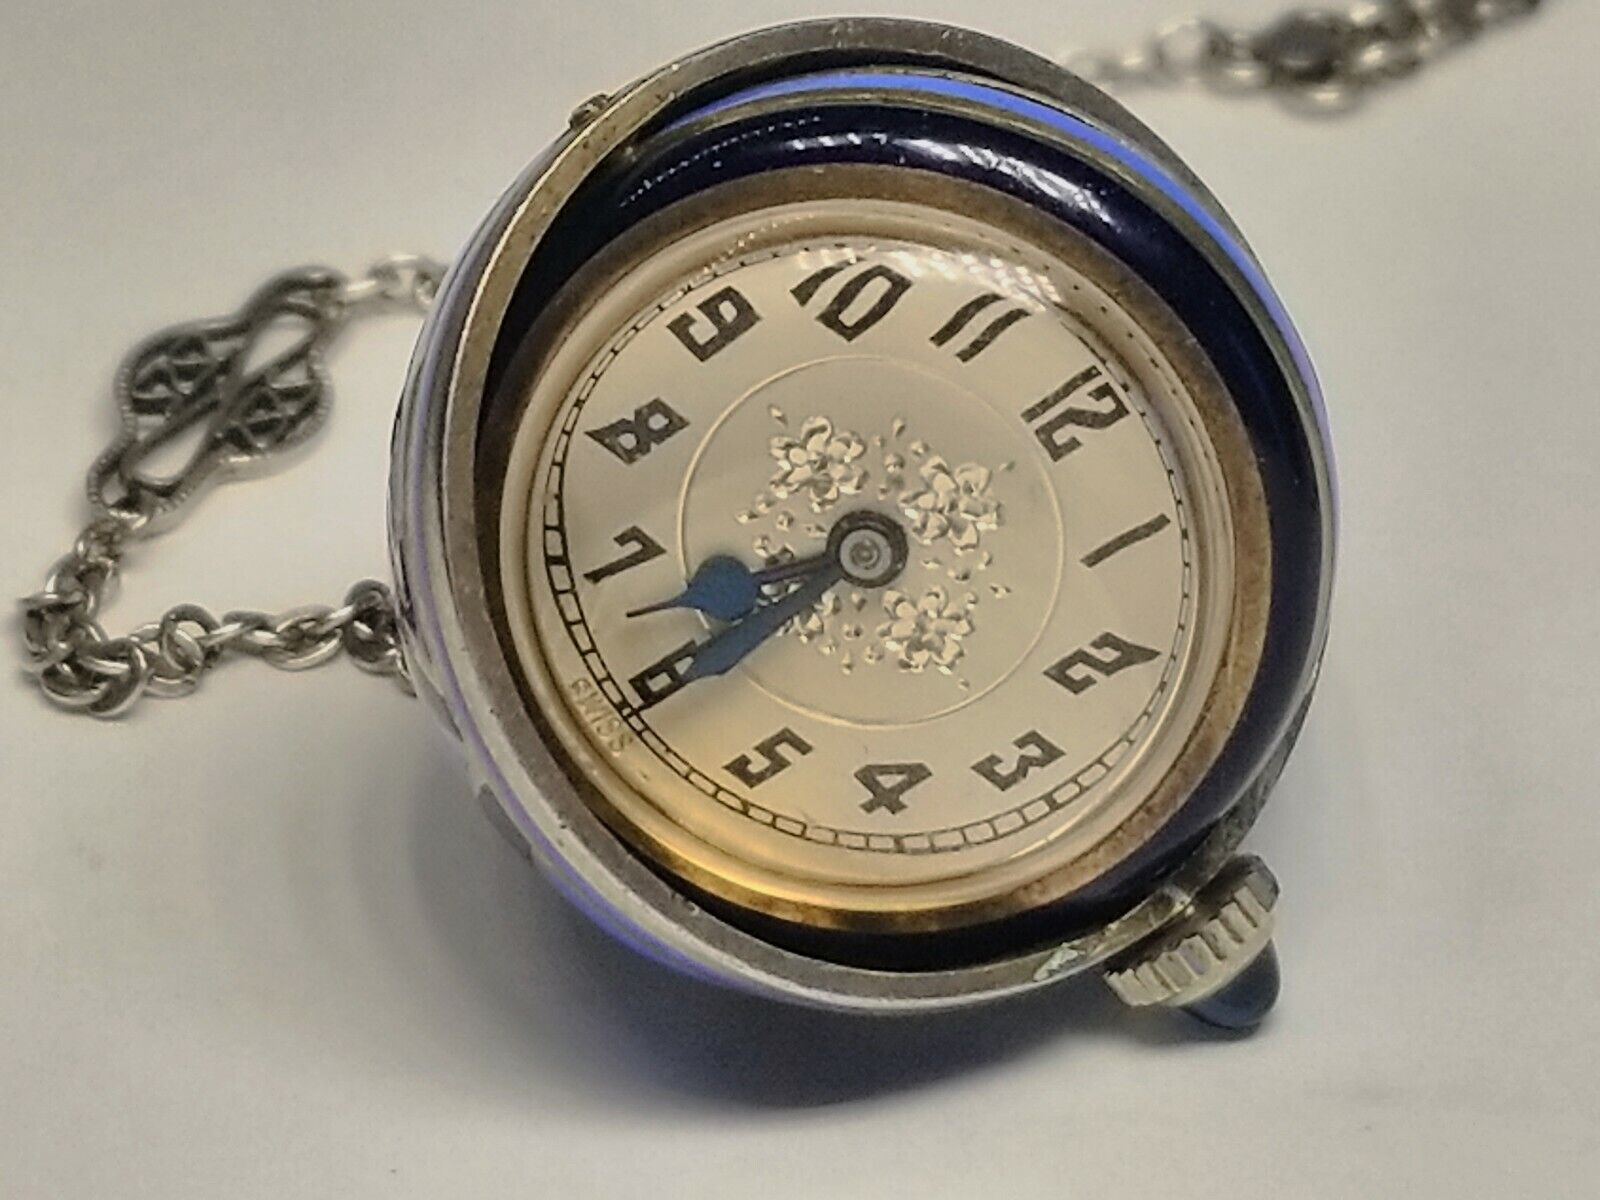 Vintage Silver Enamel Counter-Balanced Rotating Pocket Watch Pendant Necklace